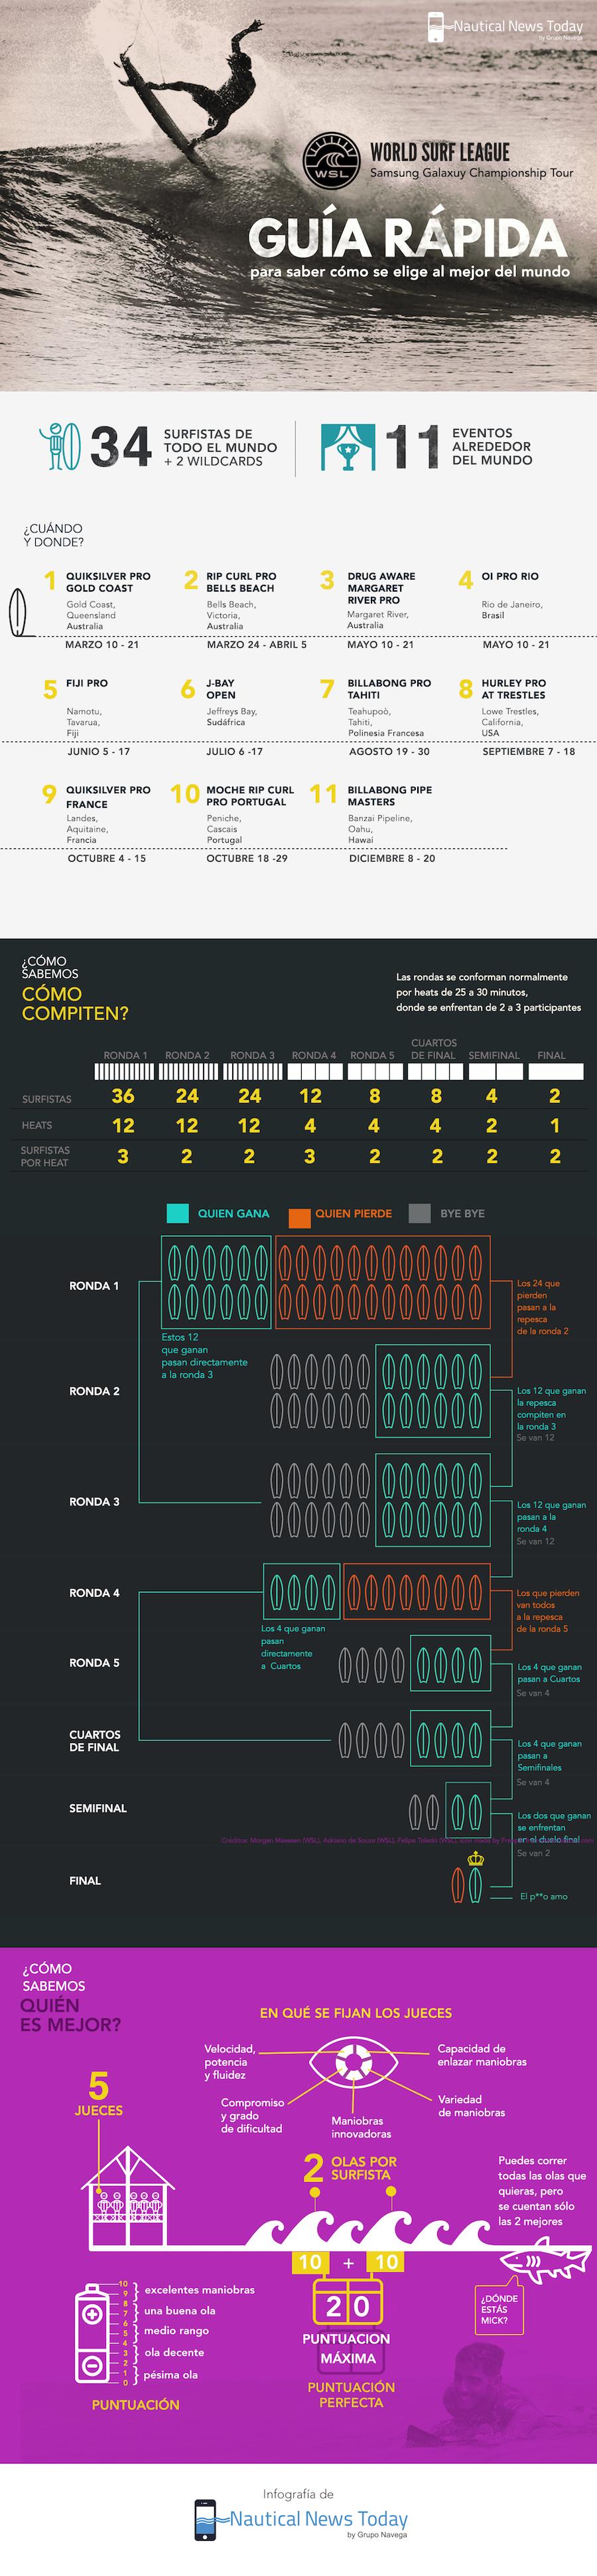 Infografia Samsung Galaxy Championship Tour 2016 P